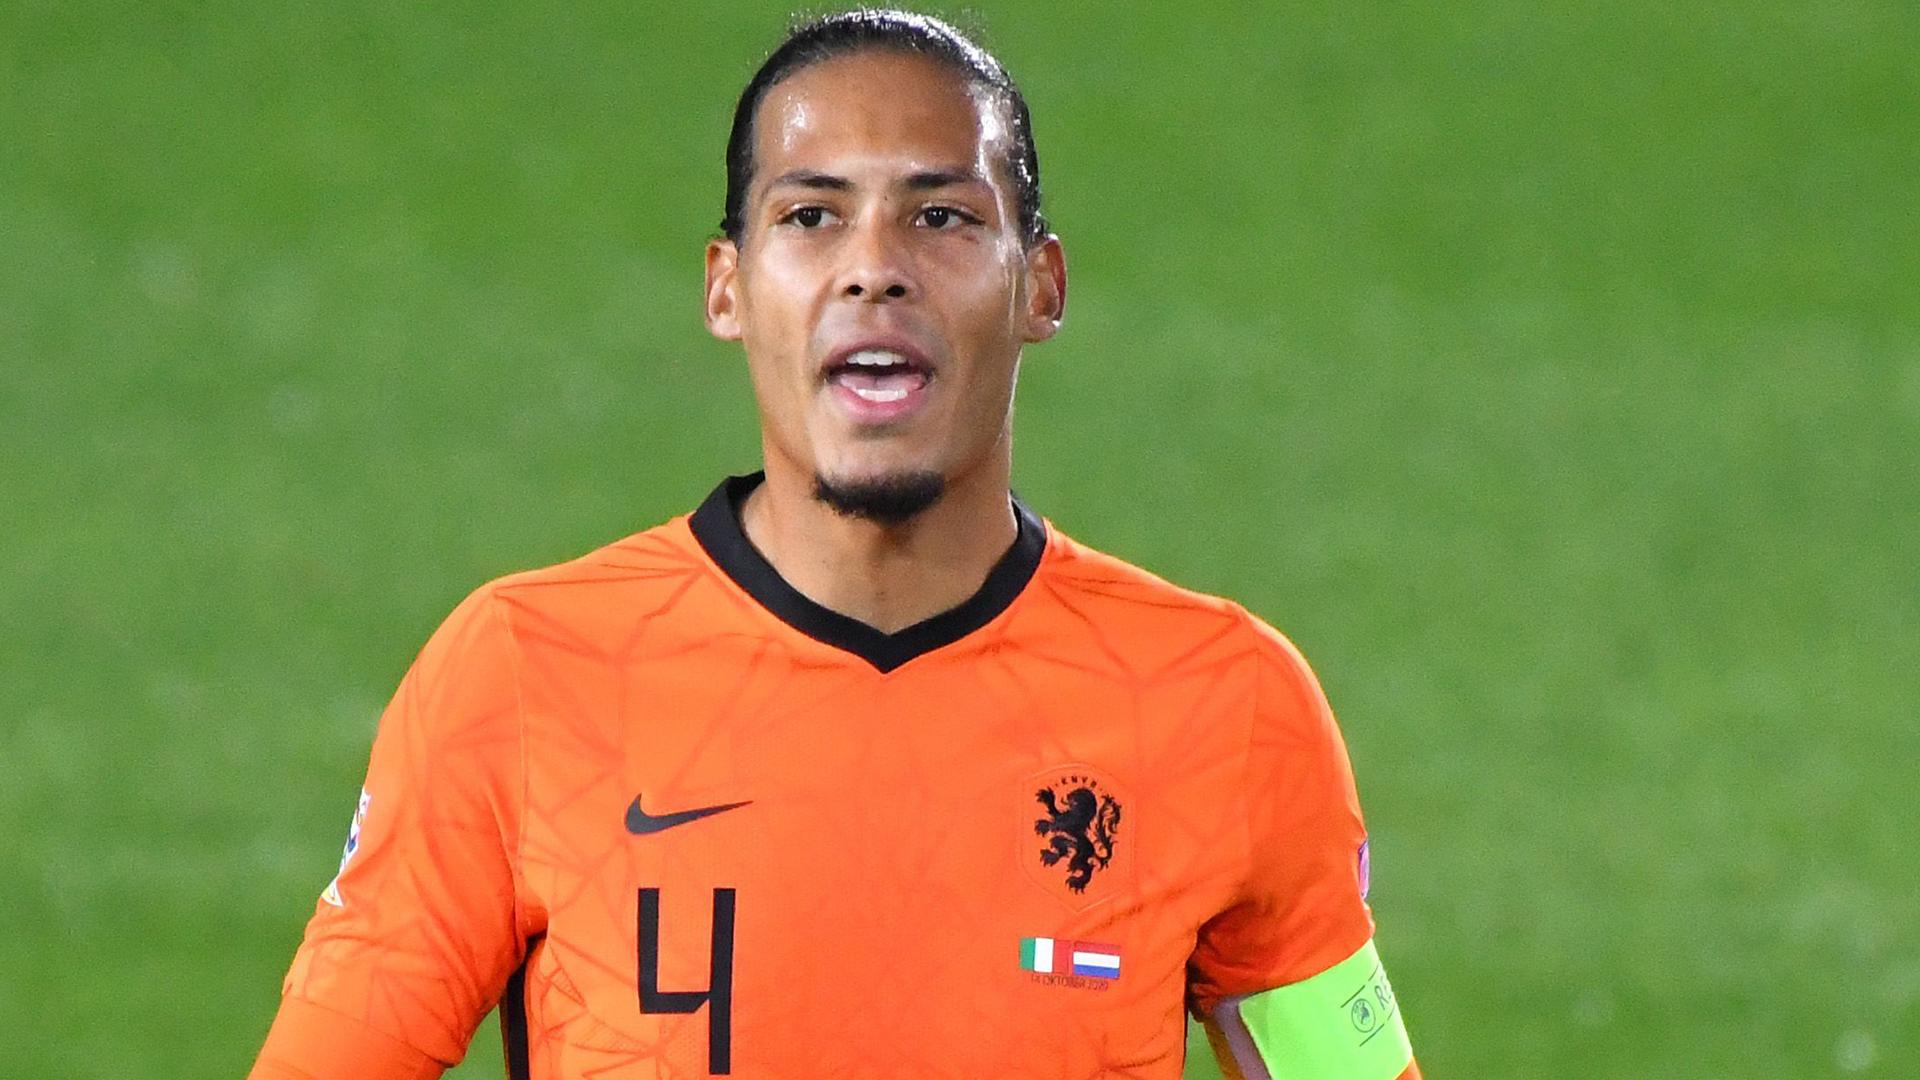 'This story is completely false!' - Van Dijk denies leading Netherlands squad revolt against Van Gaal return